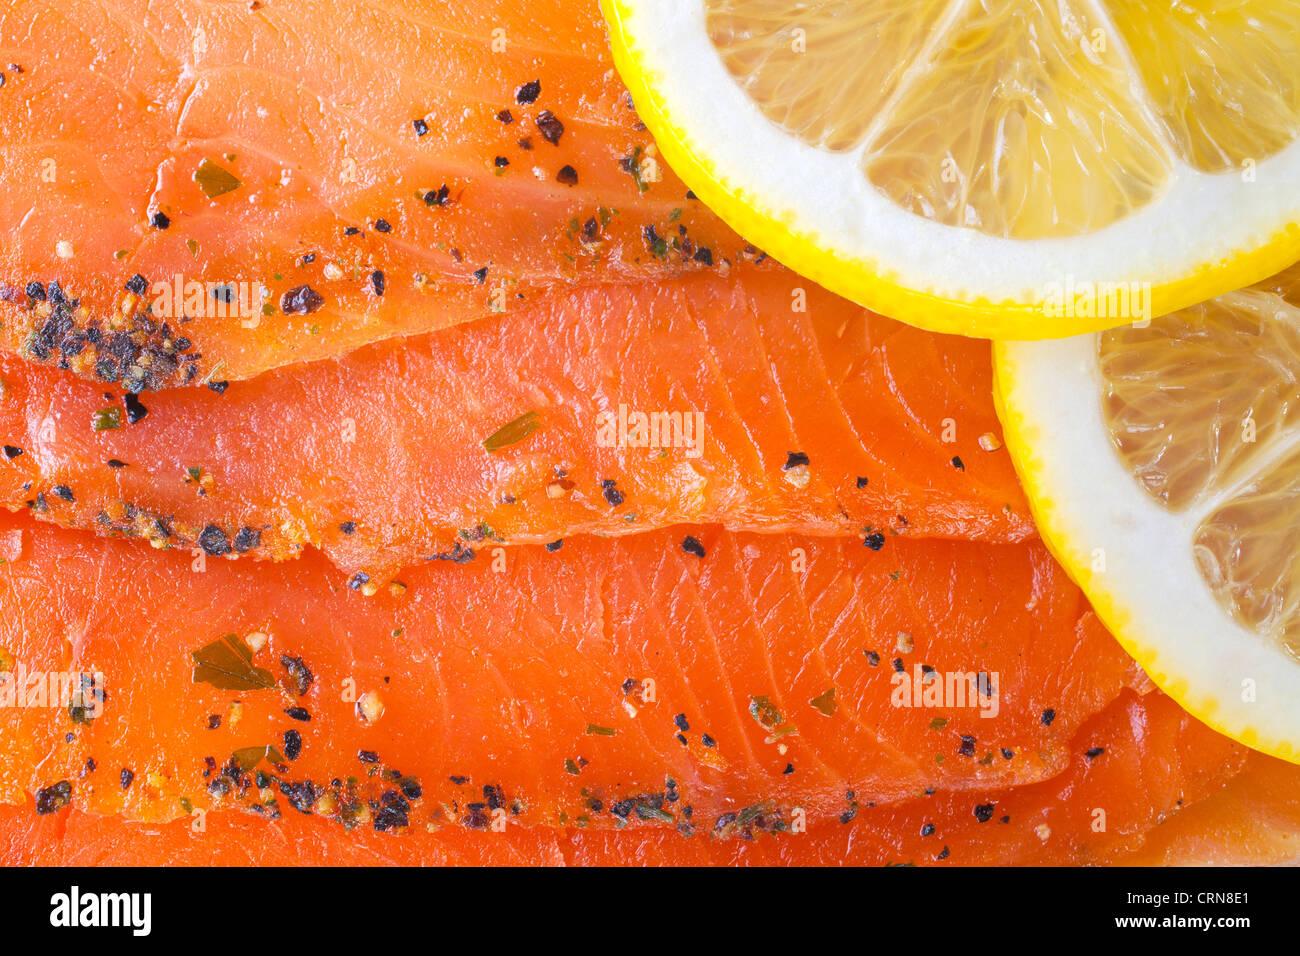 Seasoned smoked salmon with lemon slices - Stock Image